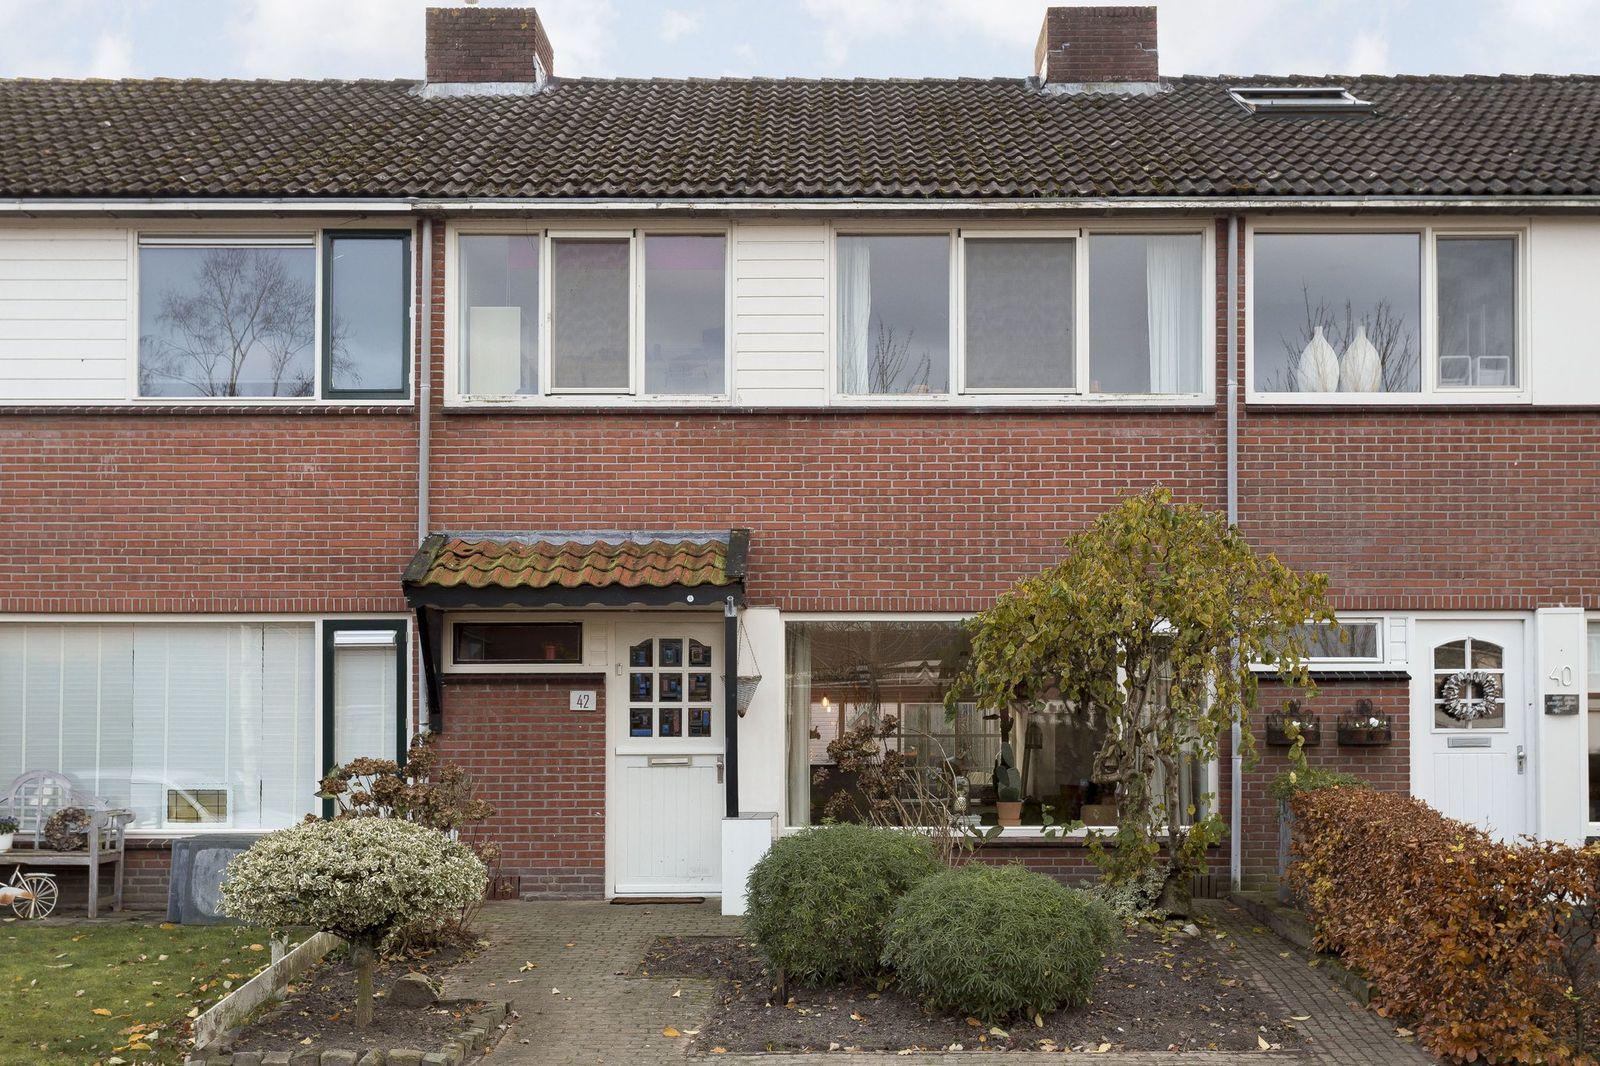 Willem Kloosstraat 42, Nijverdal